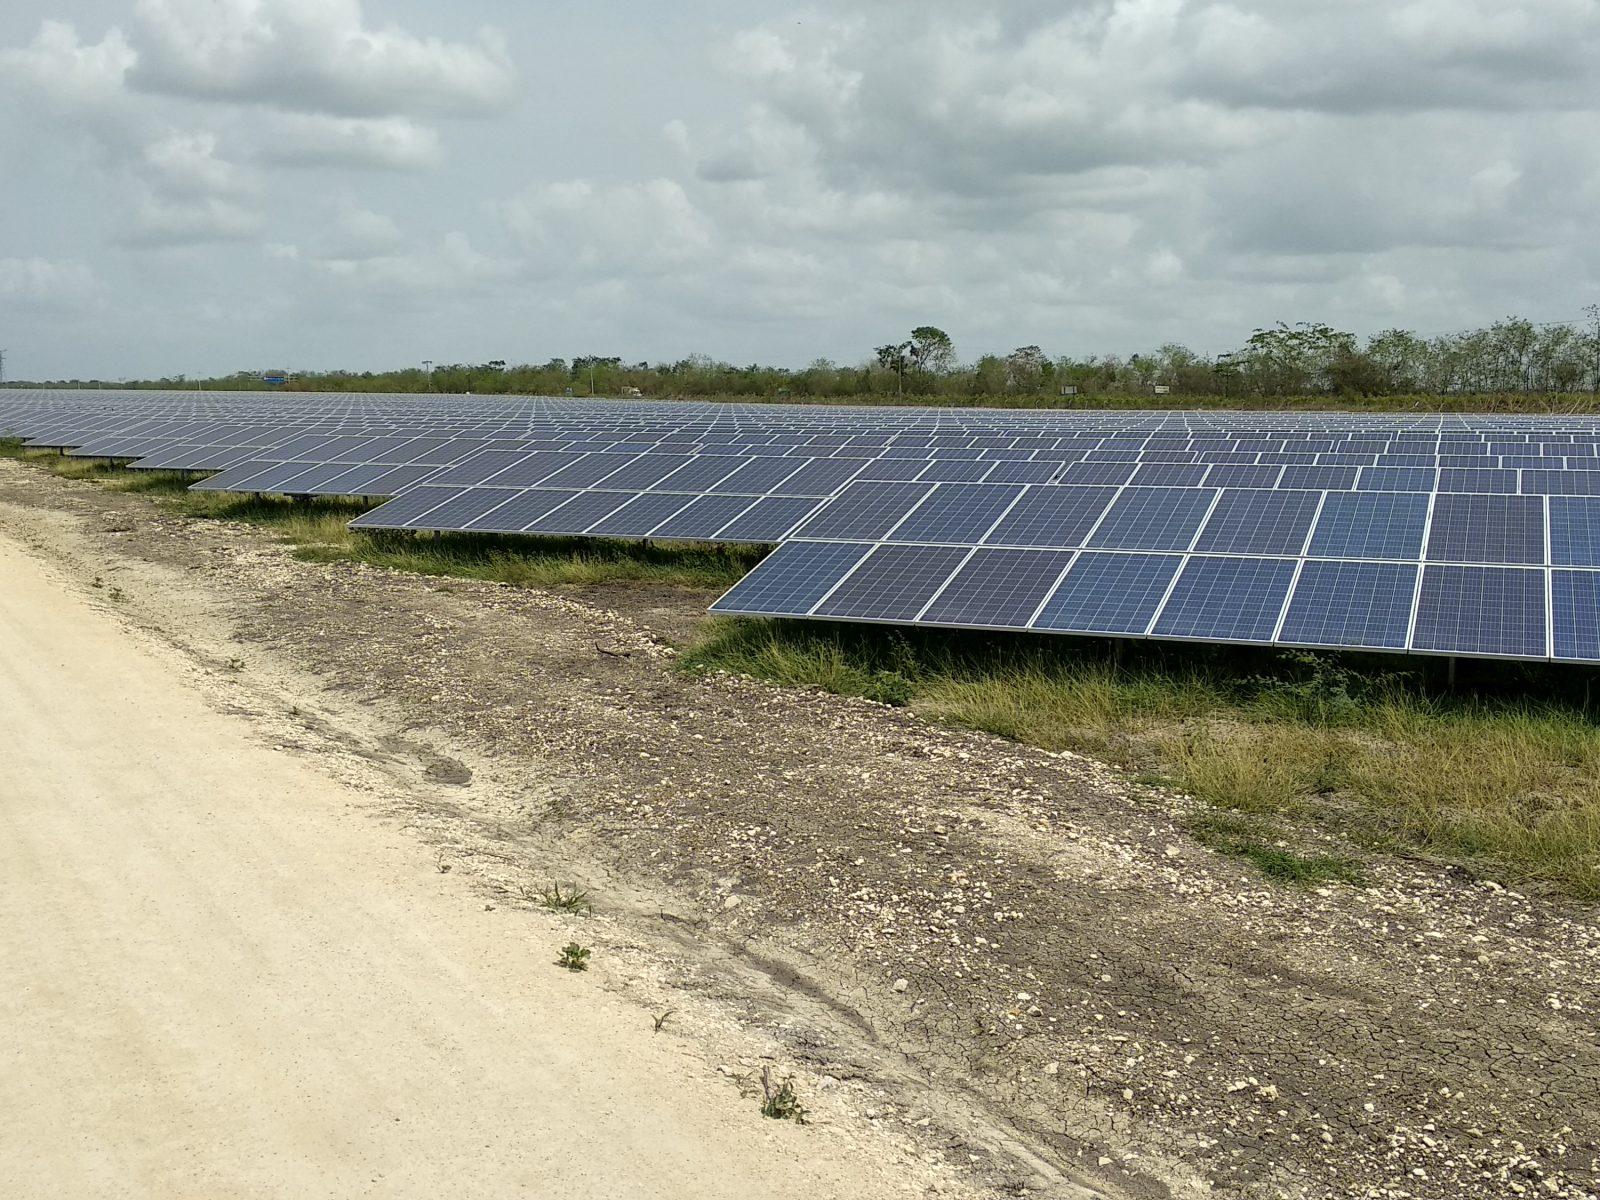 Mantenimiento huerto solar: 36 MWp (México)